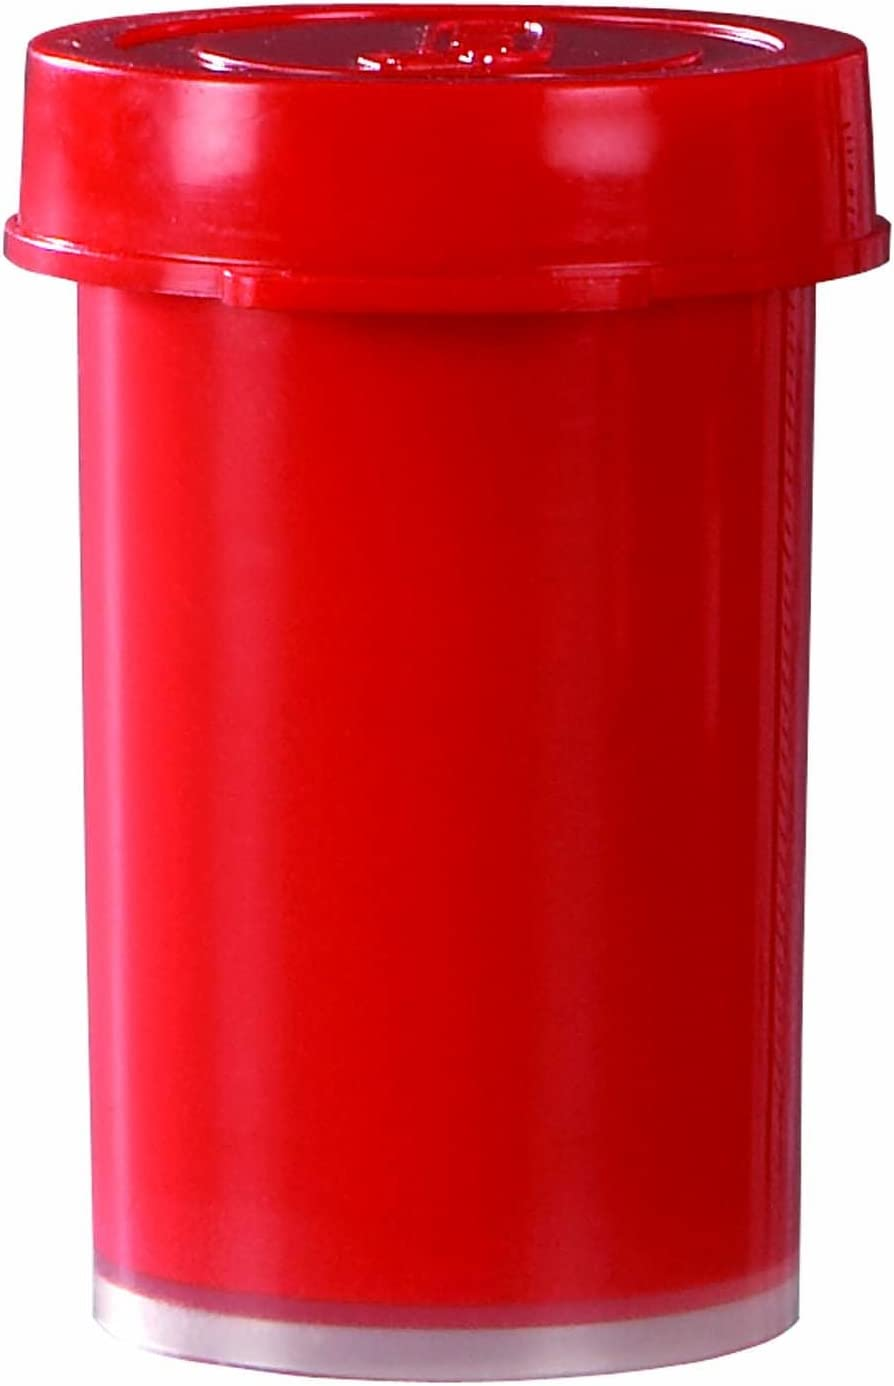 521 Unbekannt Jovi Federm/äppchen Temperafarben 12/x 15/ml Colore Sortiert